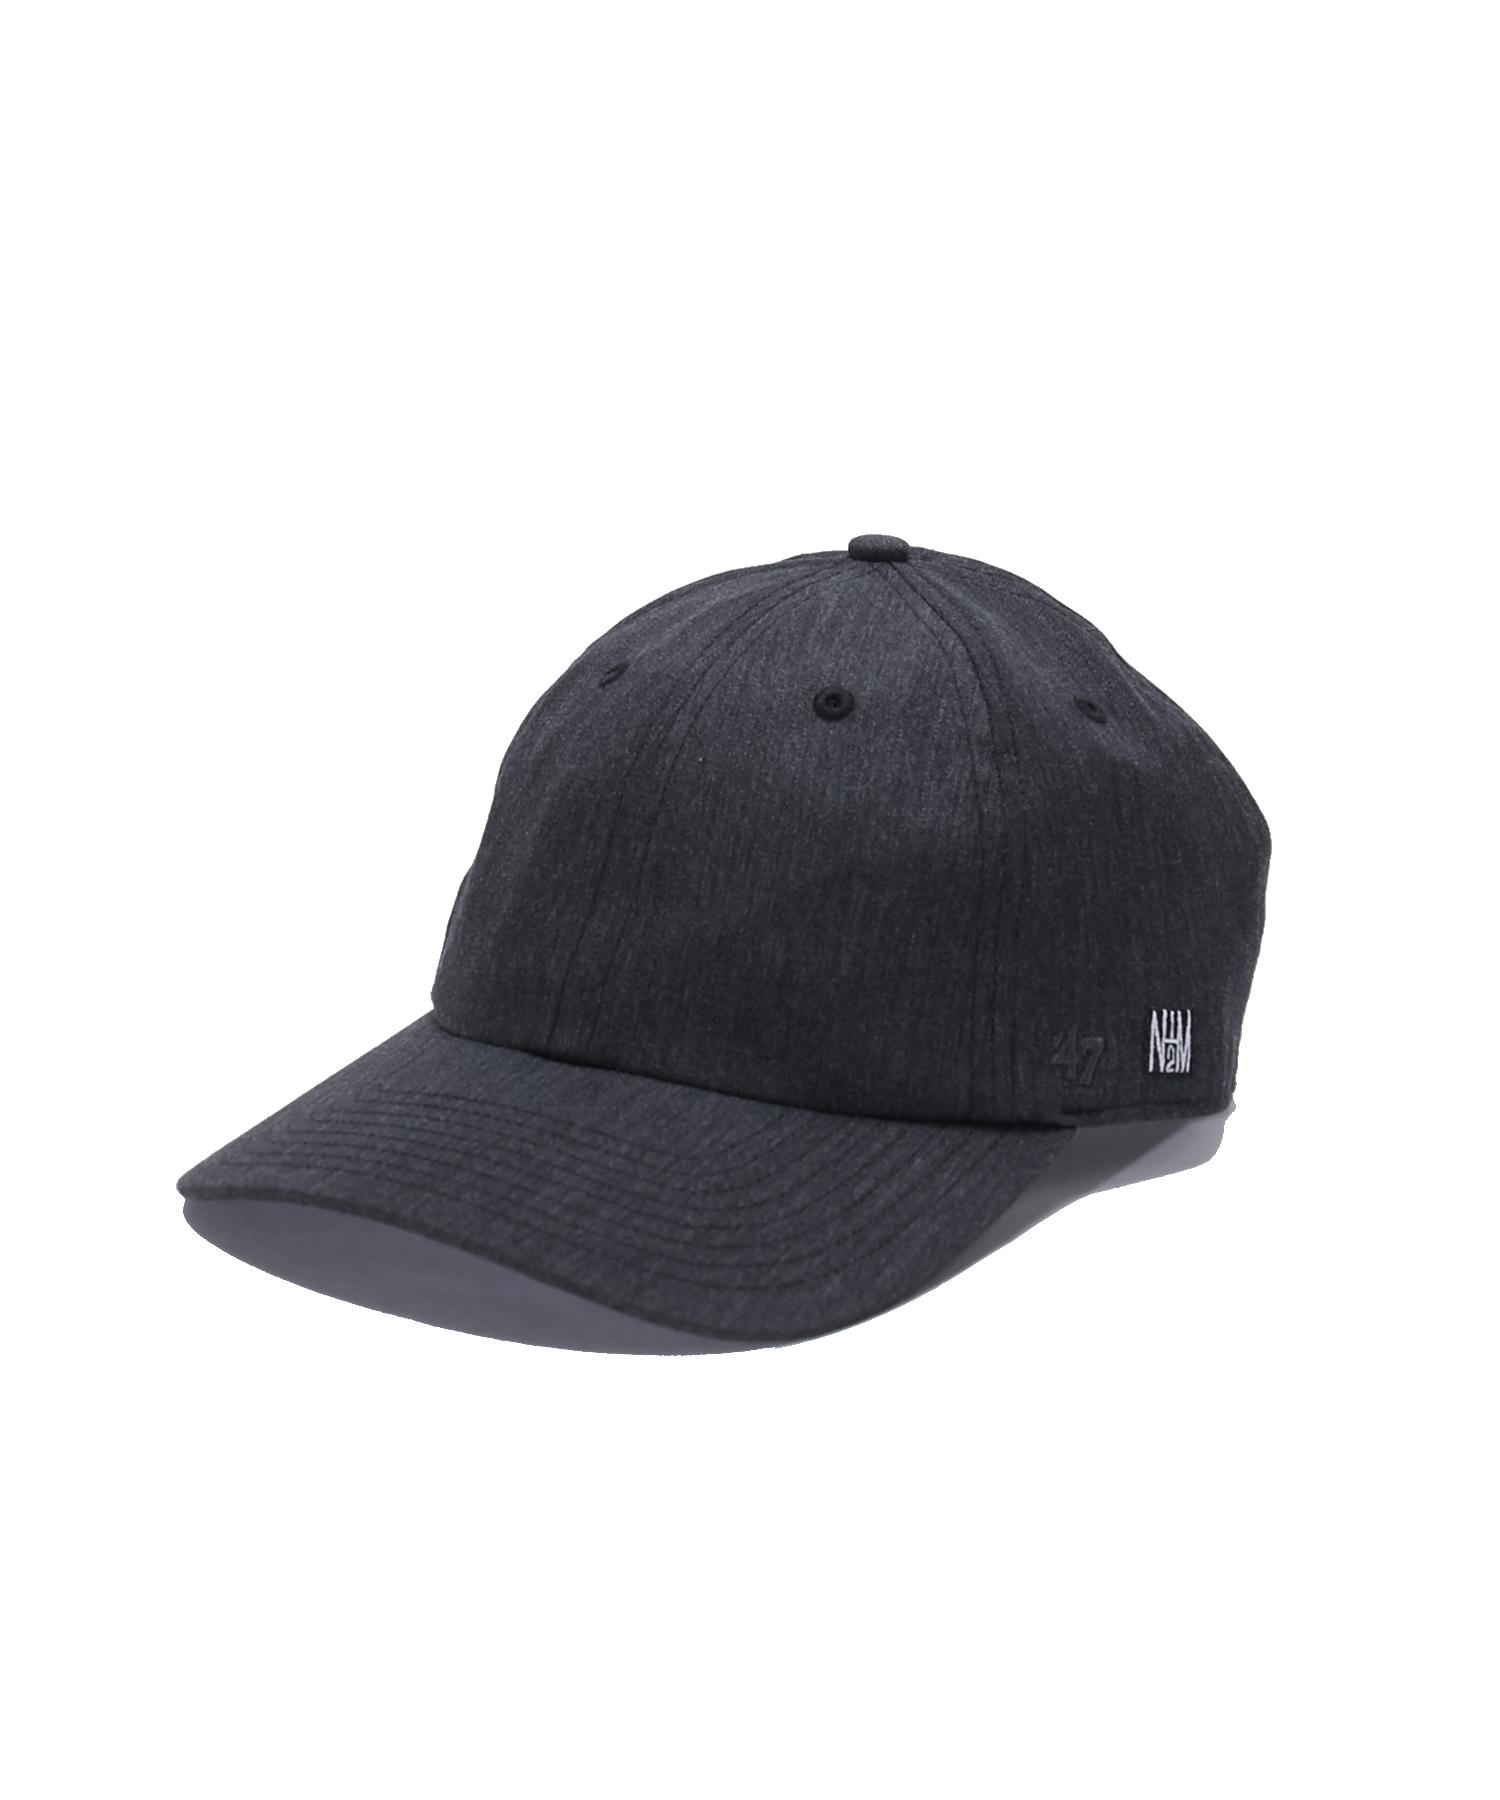 FALL2019 CAP 【N.HOOLYWOOD × '47BRAND】